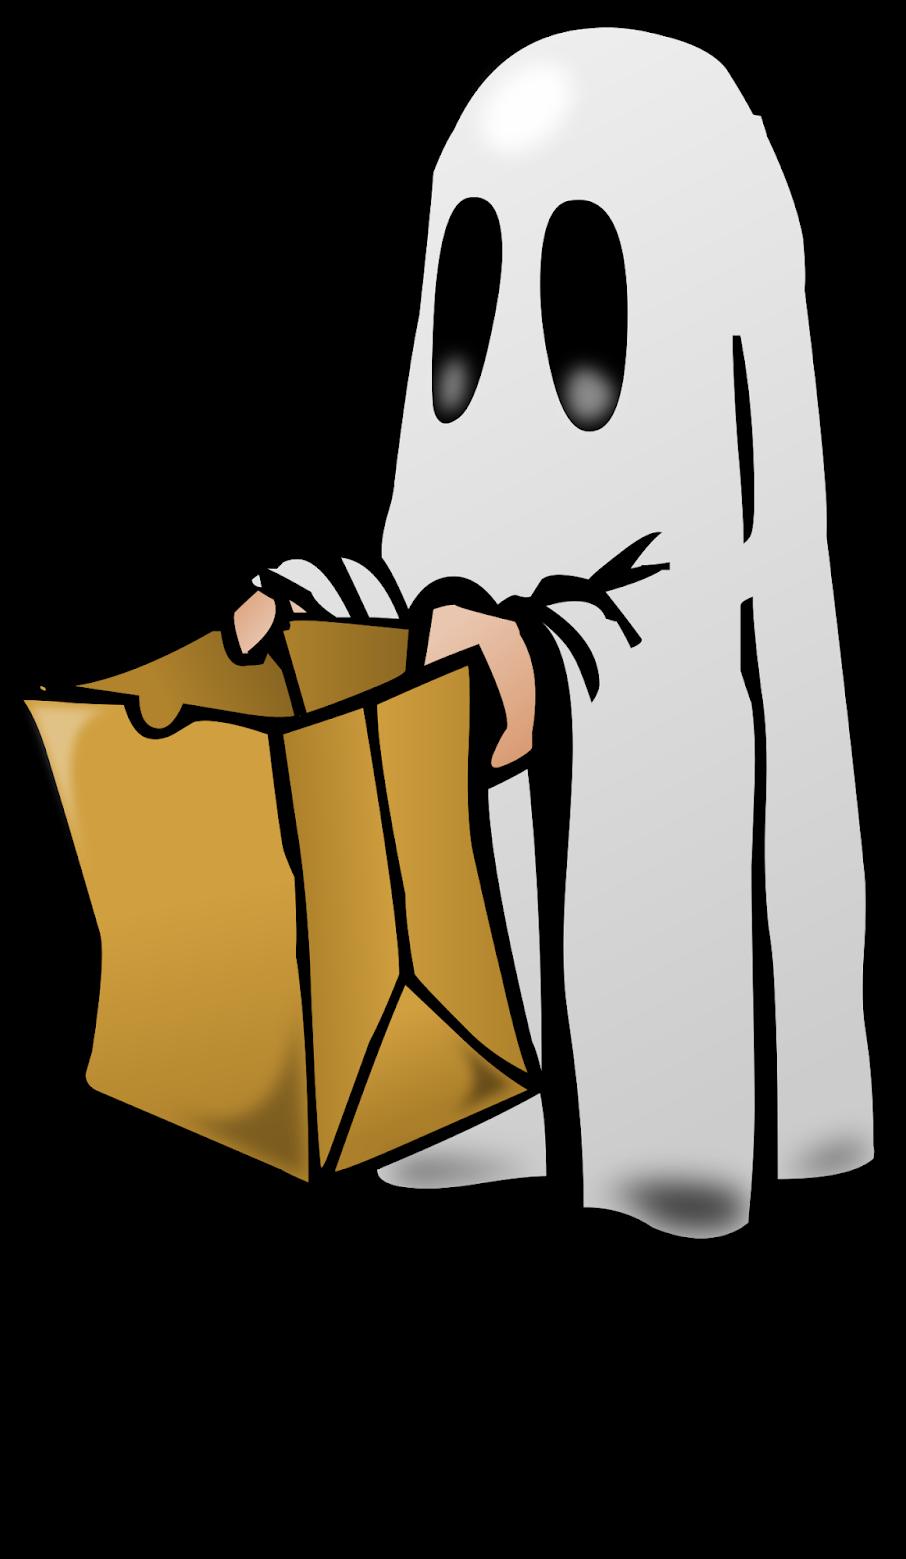 Pumpkin Halloween Trick-or-treating Clip Art - Candy - Transparent Trick Or Treat  Clipart Transparent PNG